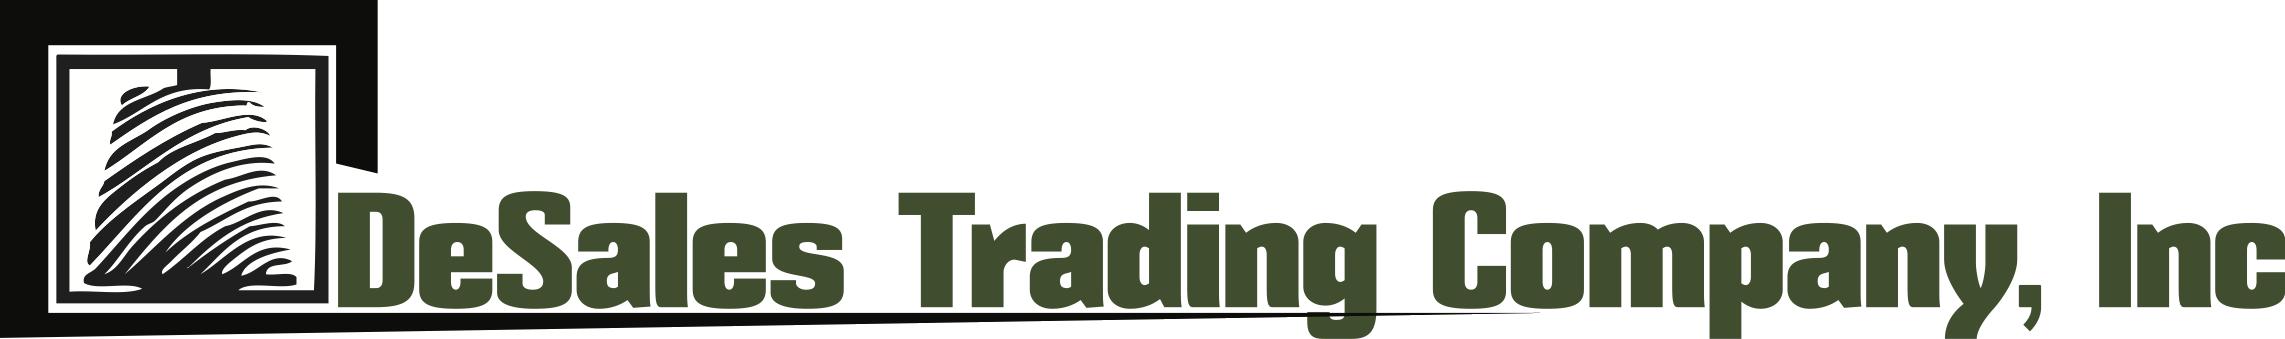 DeSales Trading Company